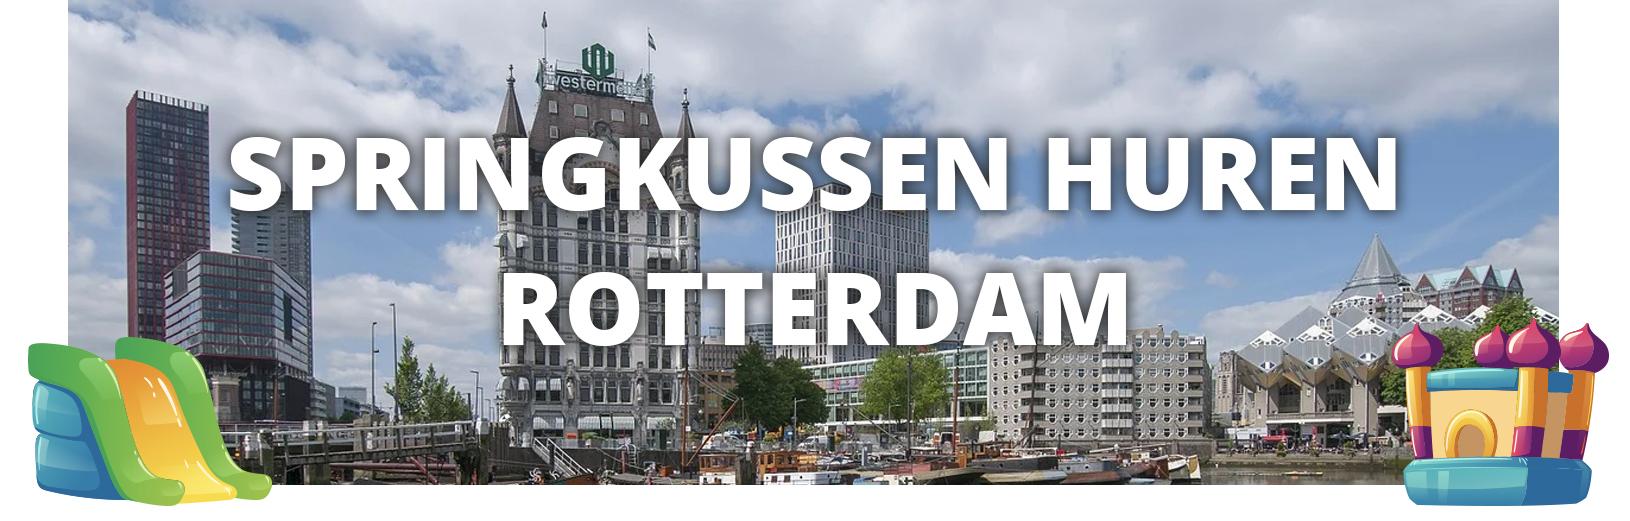 Springkussen huren Rotterdam